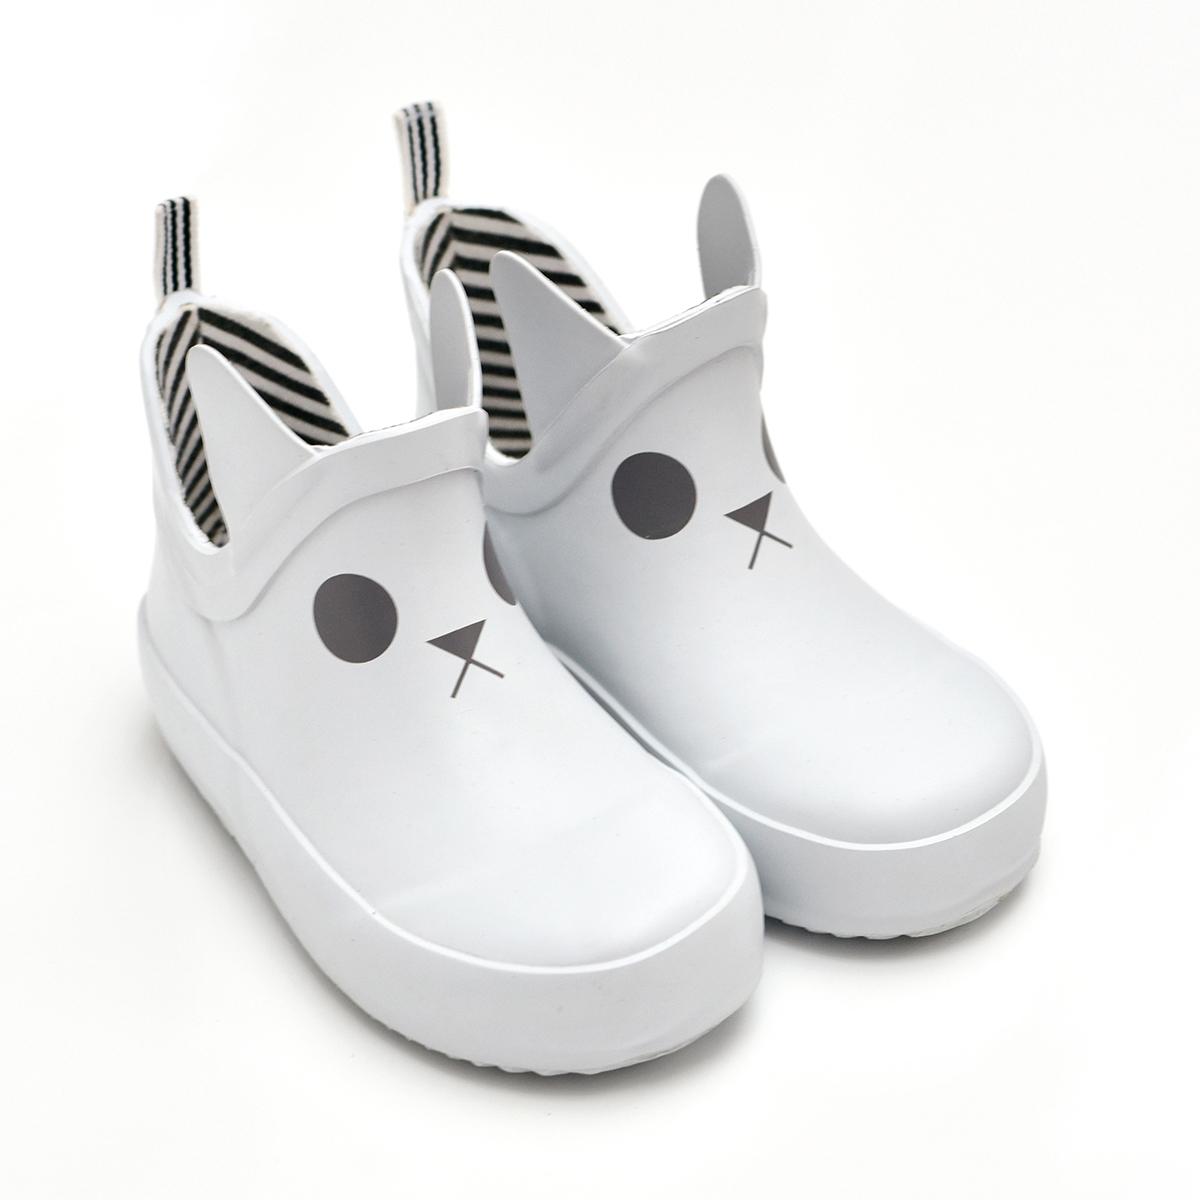 Chaussons & Chaussures Bottines Kerran Blanc - 22 Bottines Kerran Blanc - 22